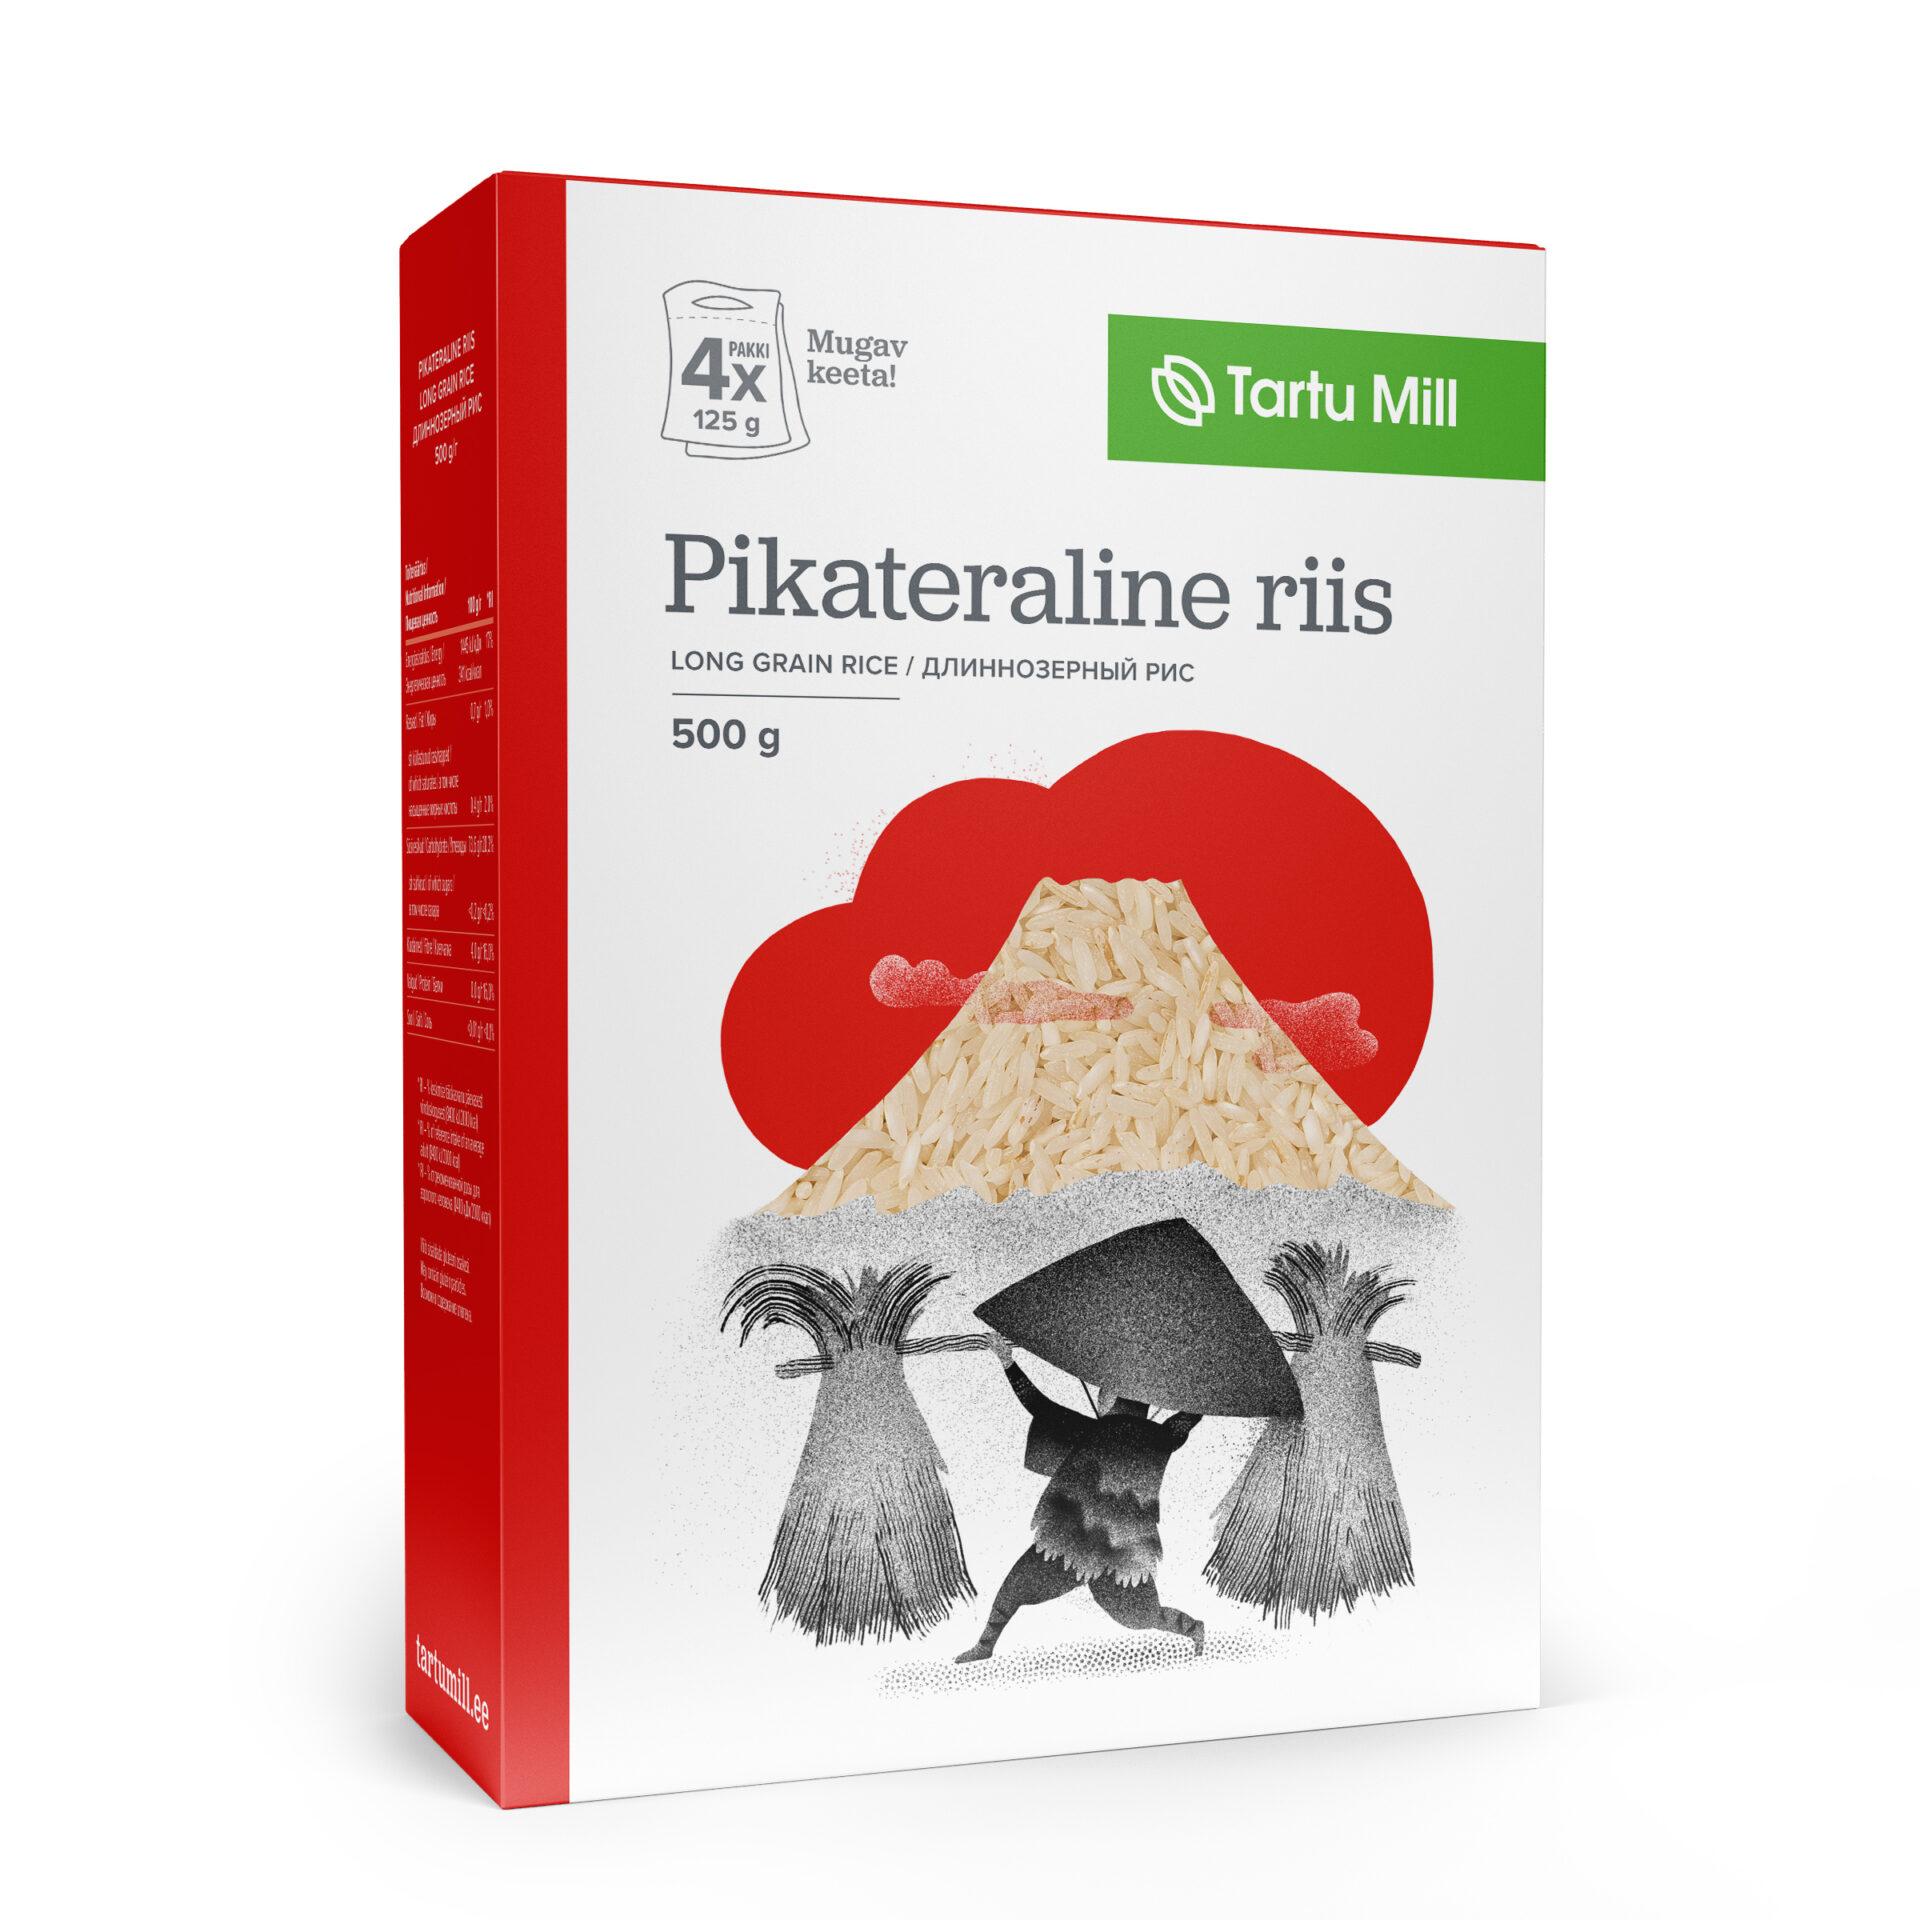 TM-pikateraline-riis-500g@2400